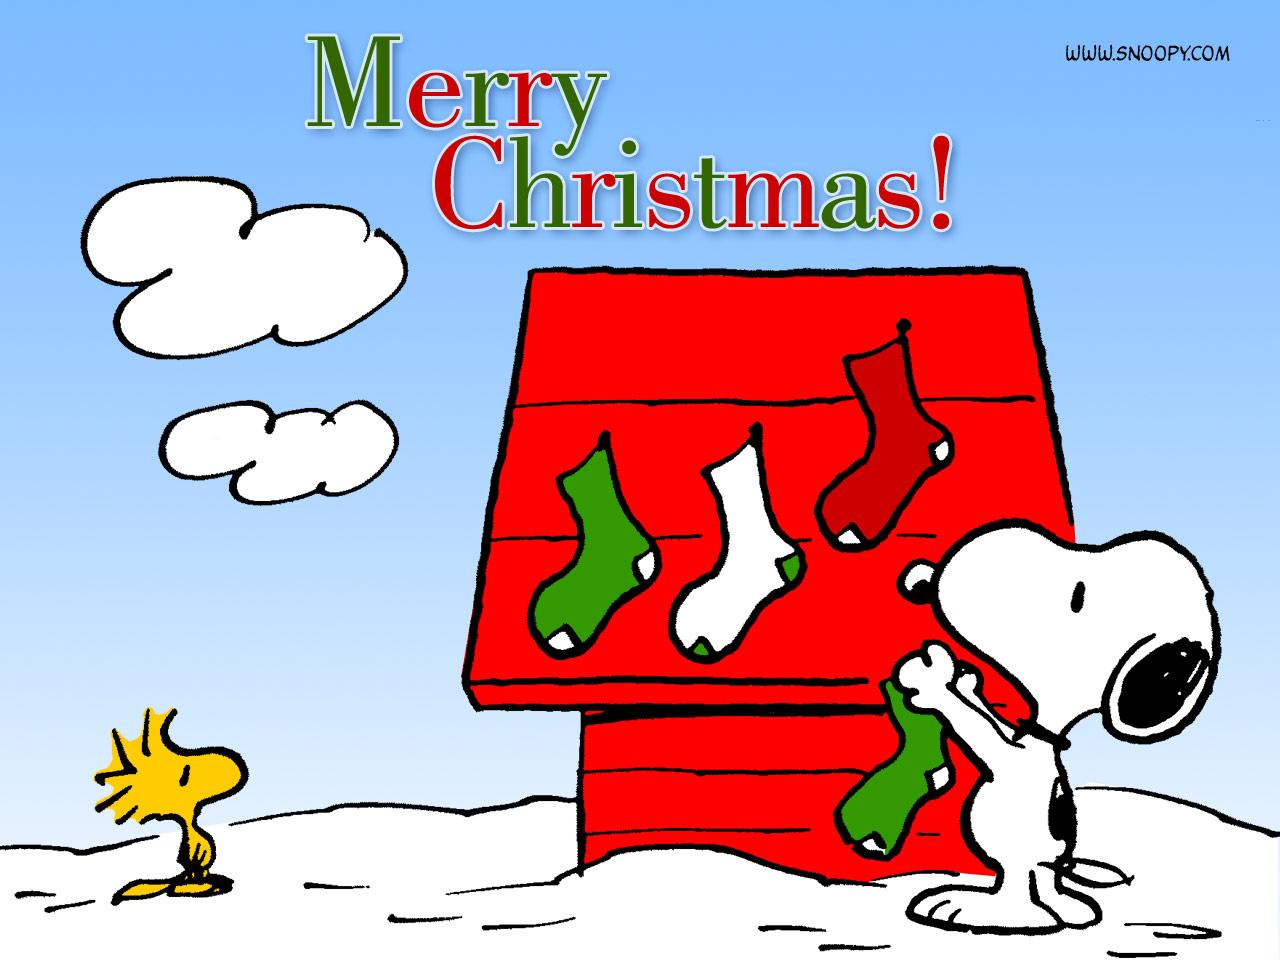 Snoopy Christmas - Peanuts Wallpaper (452770) - Fanpop